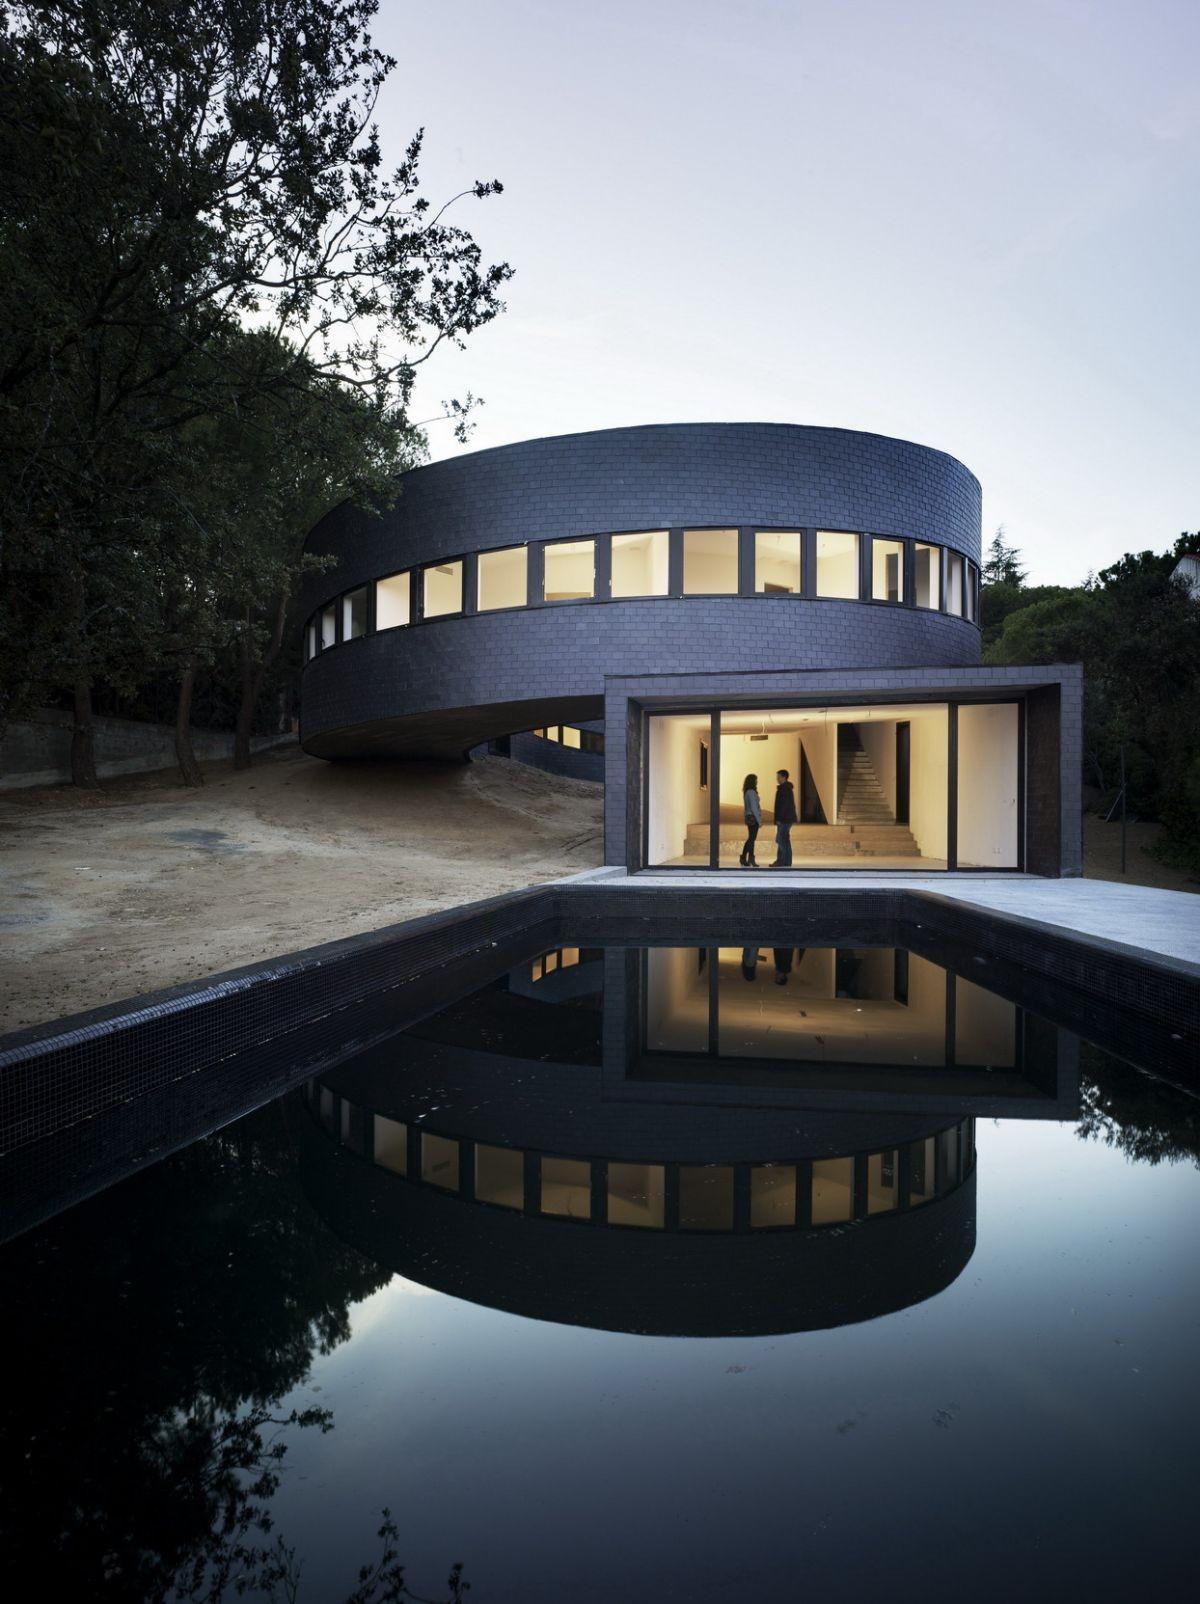 360 House / Subarquitectura, © David Frutos